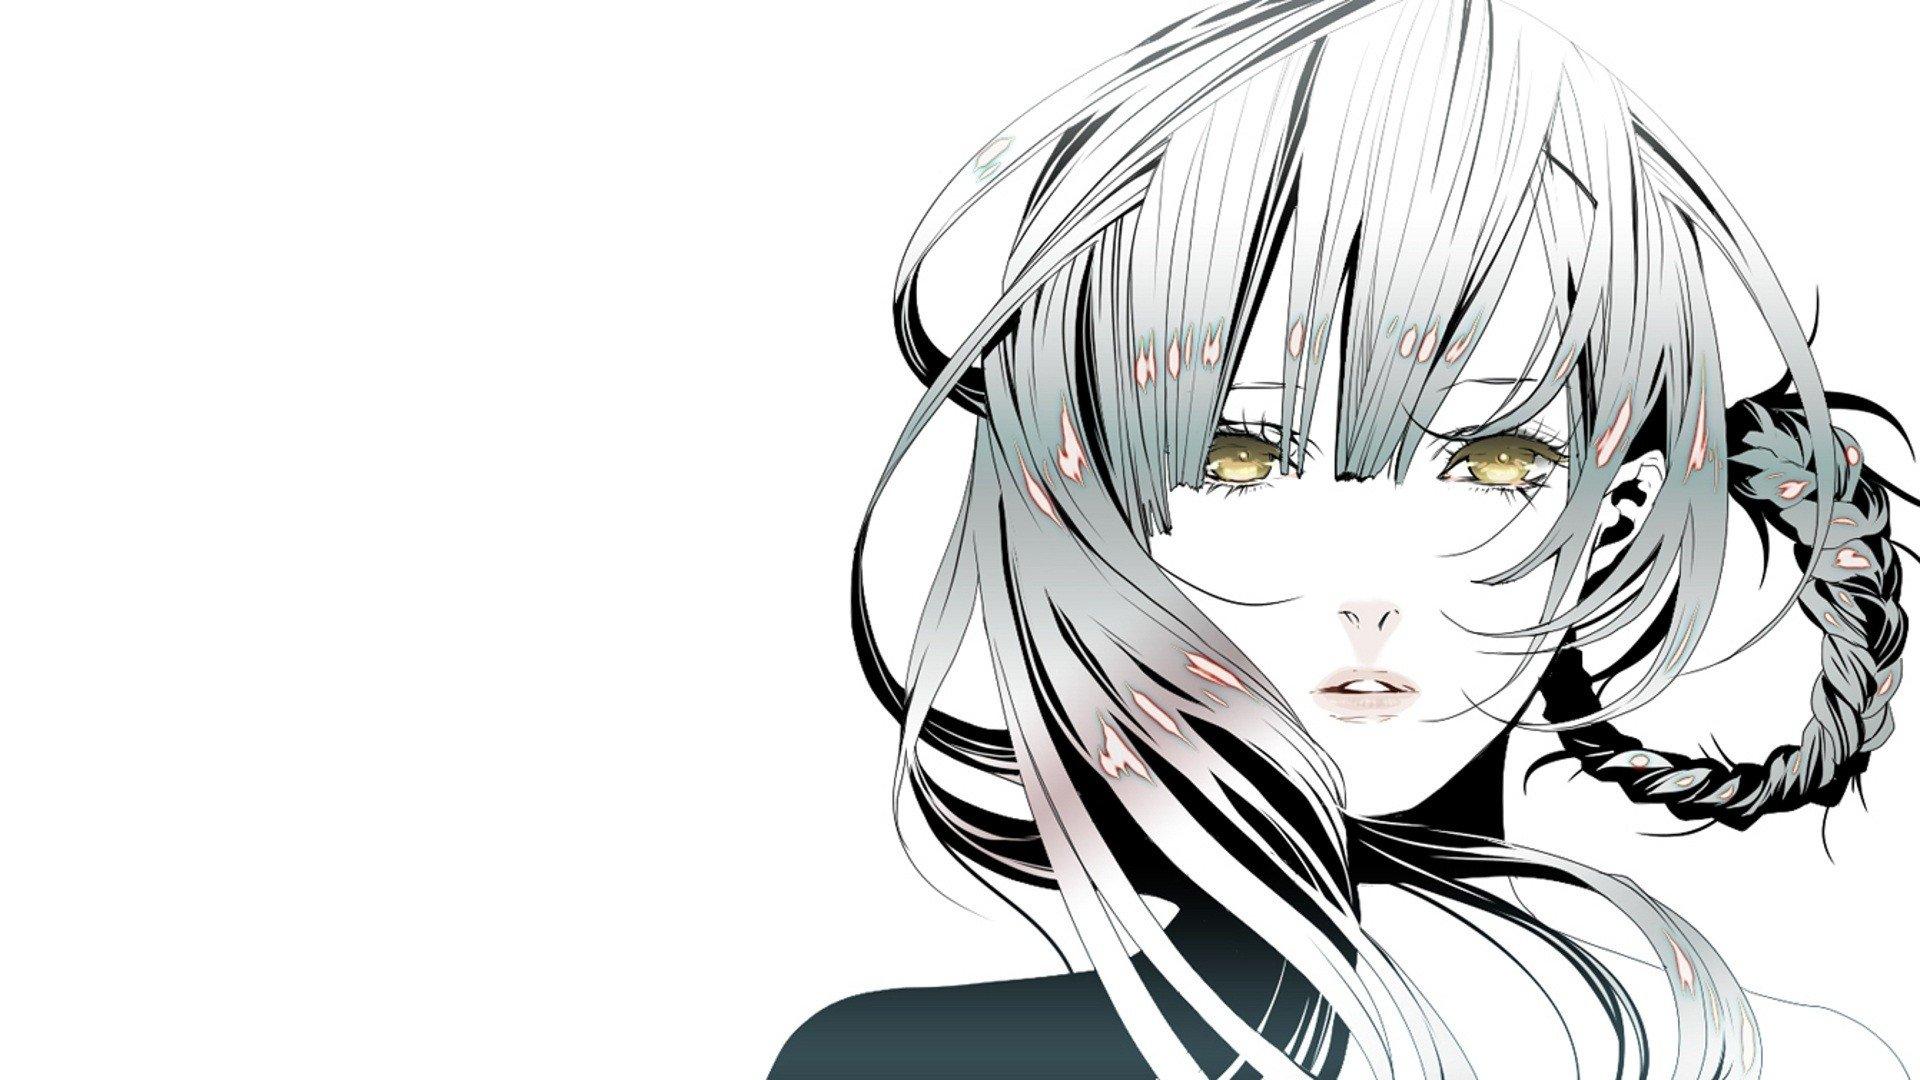 Anime Girl Big Eyes Hd Wallpapers Nier Automata Hd Wallpaper Background Image 1920x1080